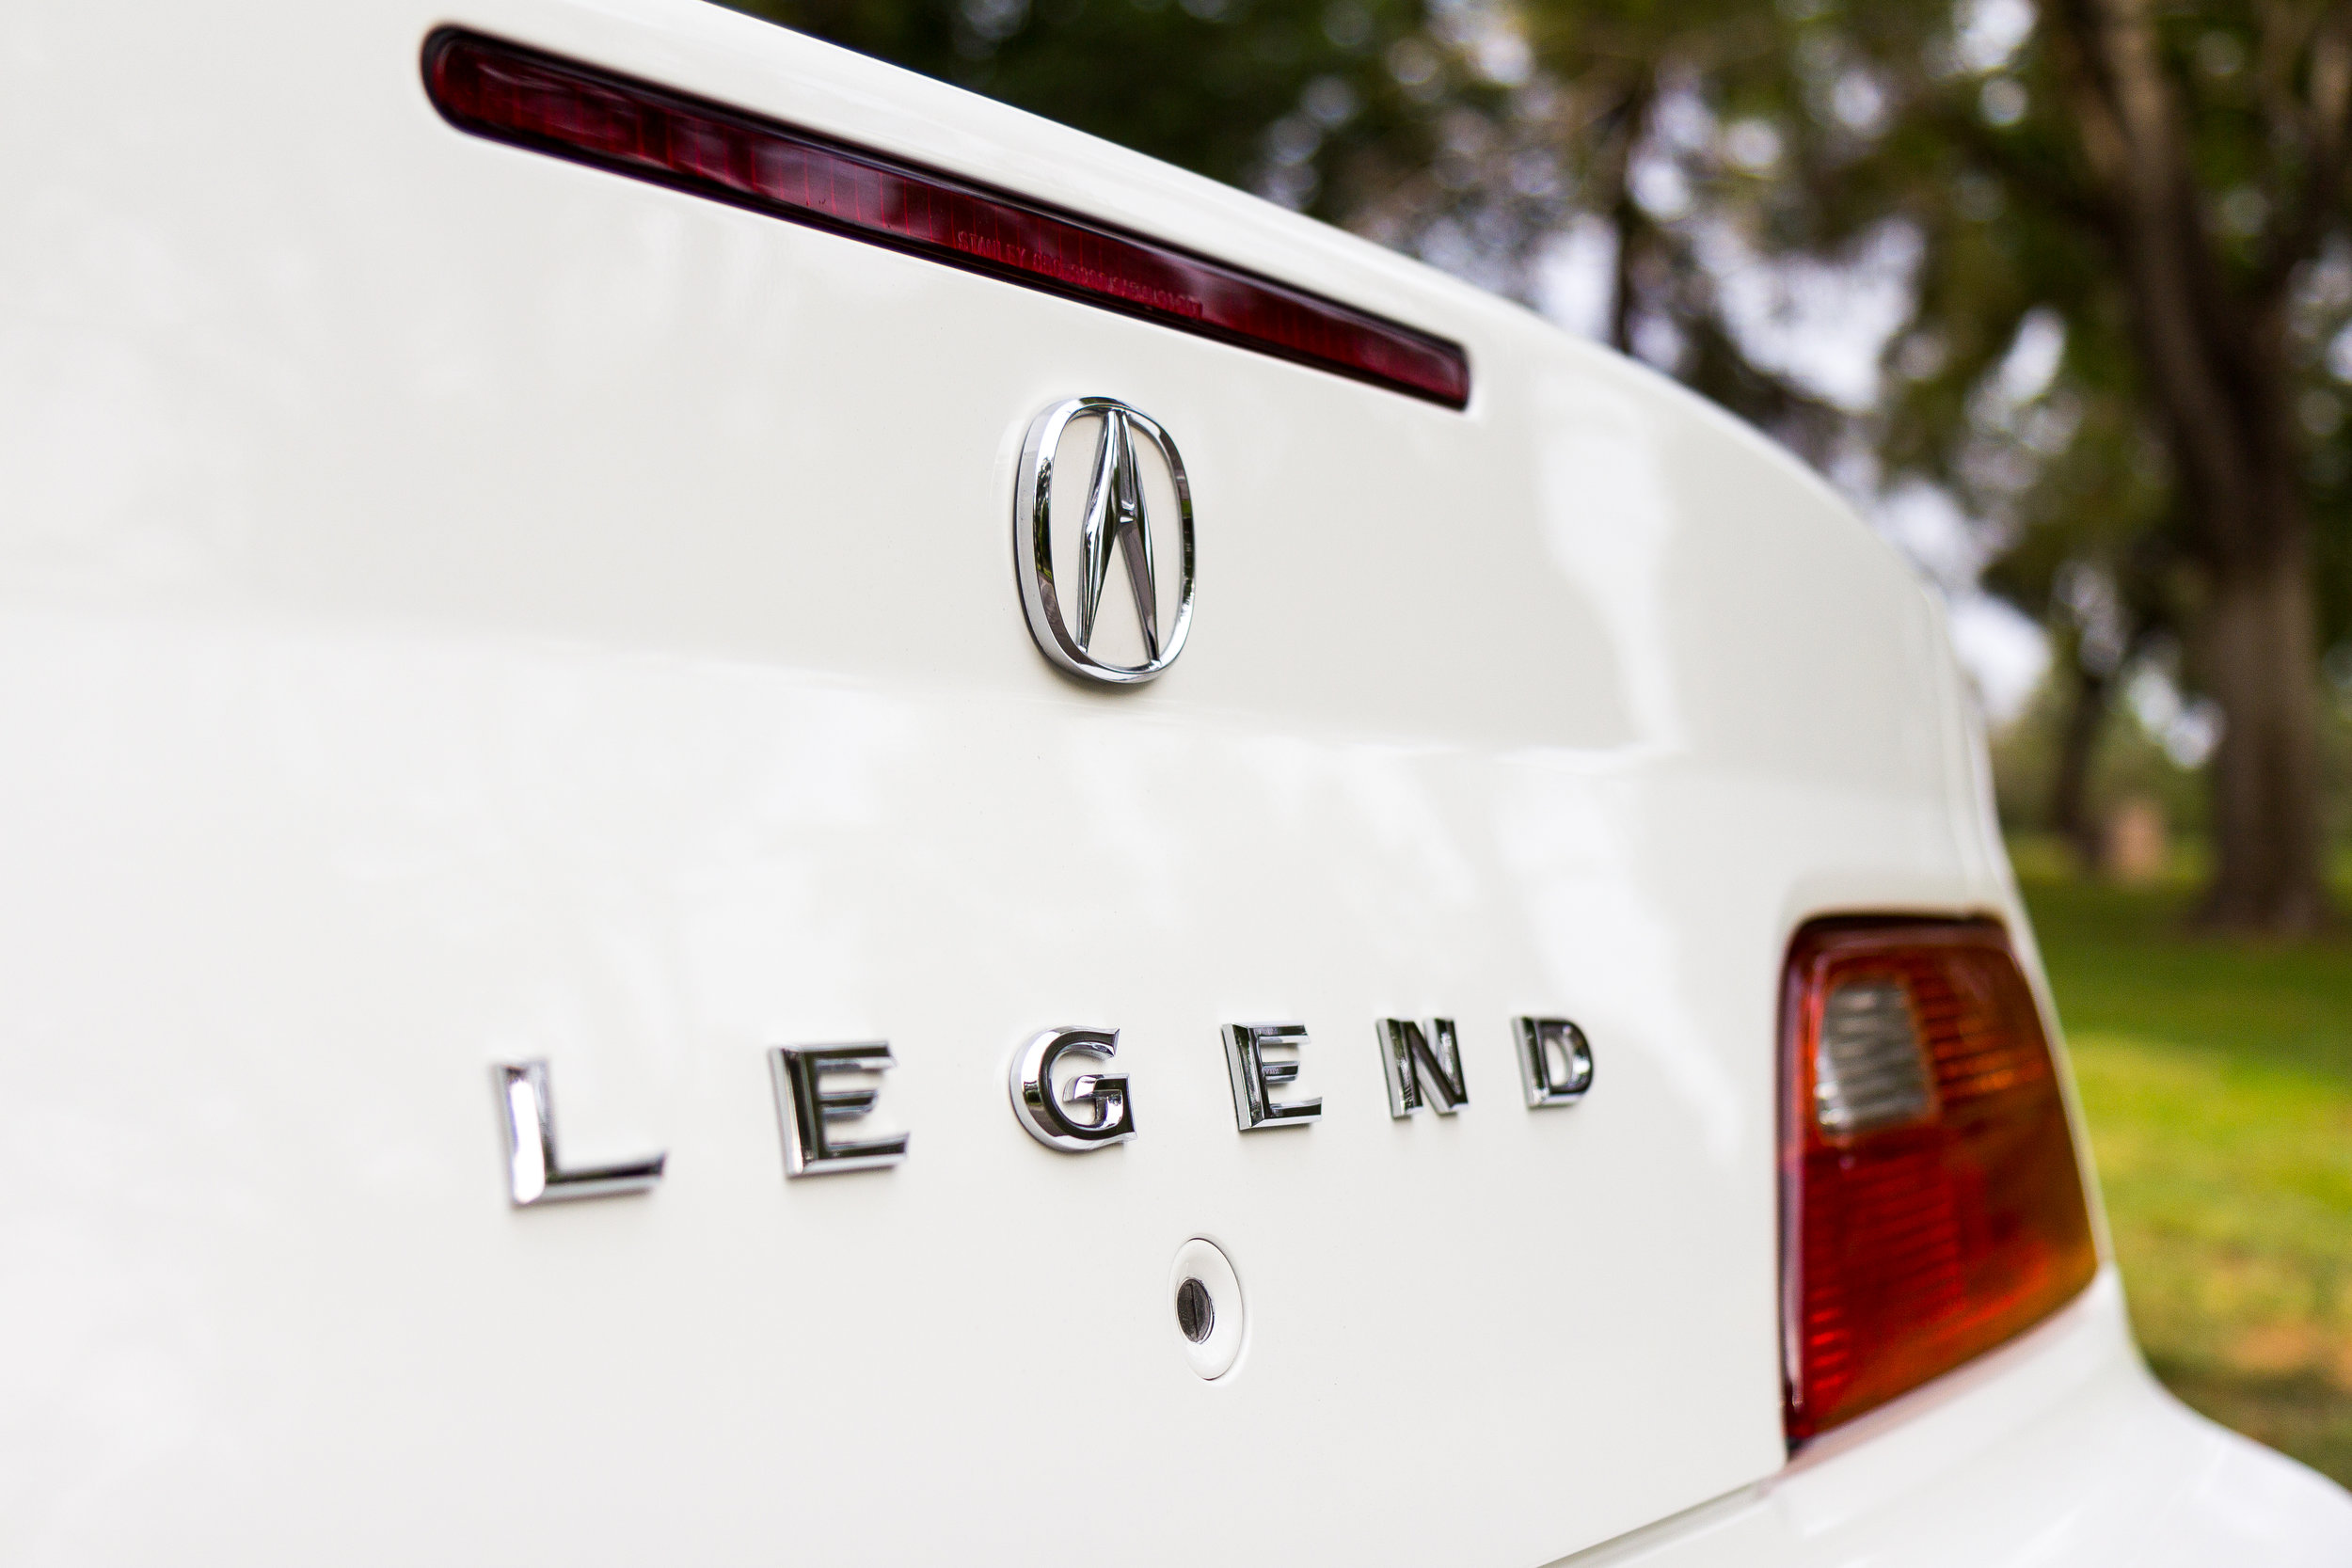 1994 Acura Legend Coupe-19.JPG